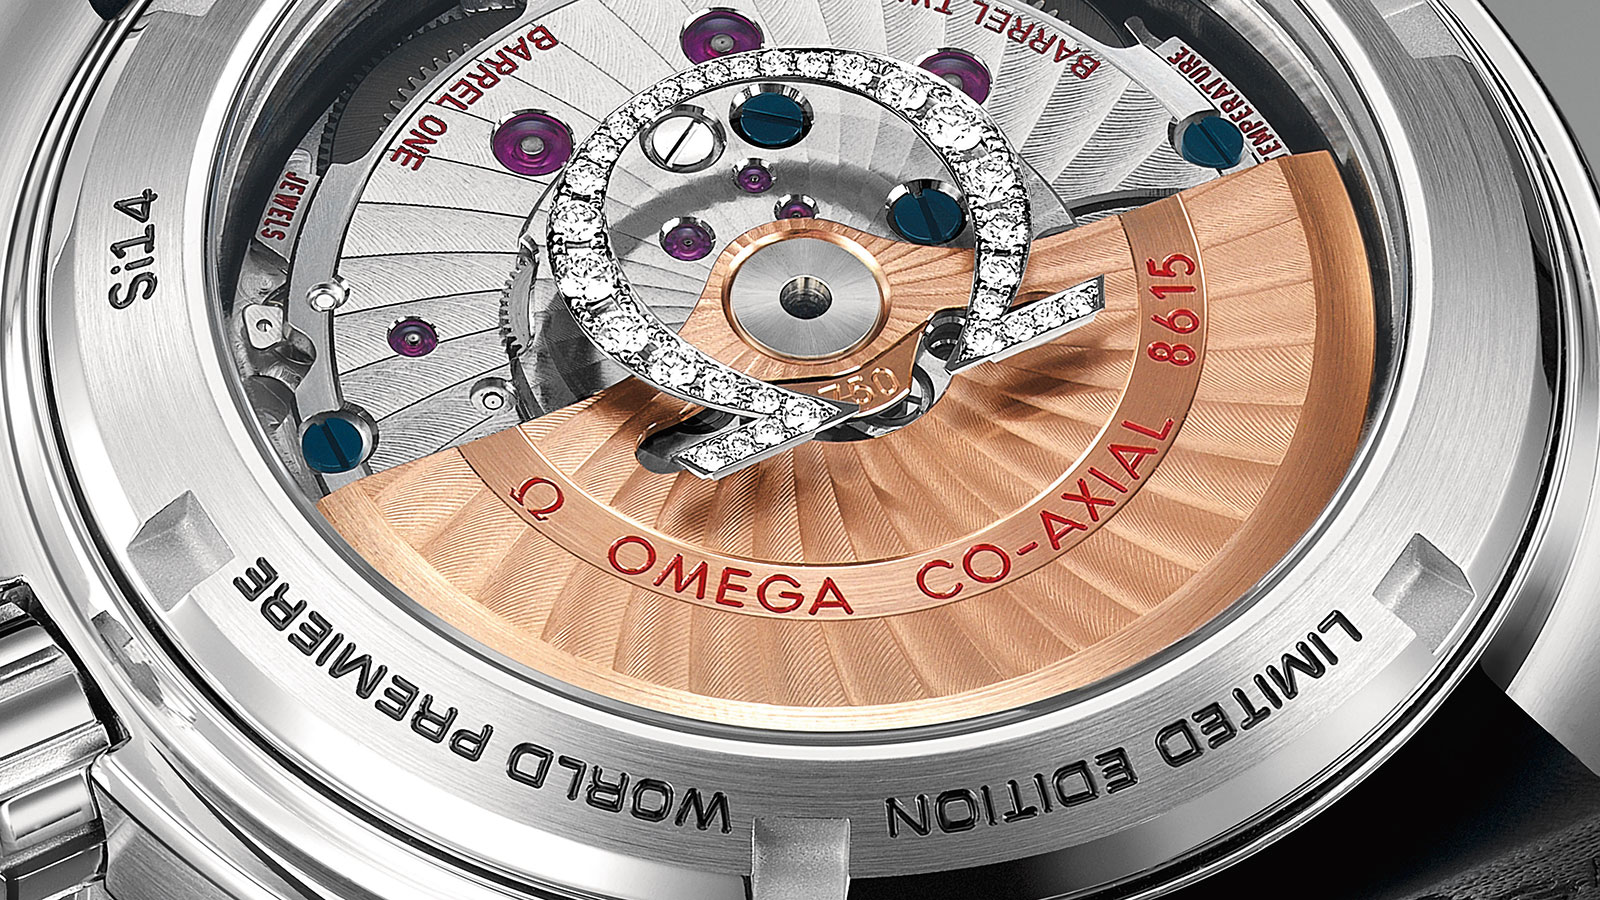 Seamaster 海洋宇宙600米腕表 海洋宇宙600米 欧米茄43.5毫米同轴GMT腕表 腕表 - 232.98.44.22.01.001